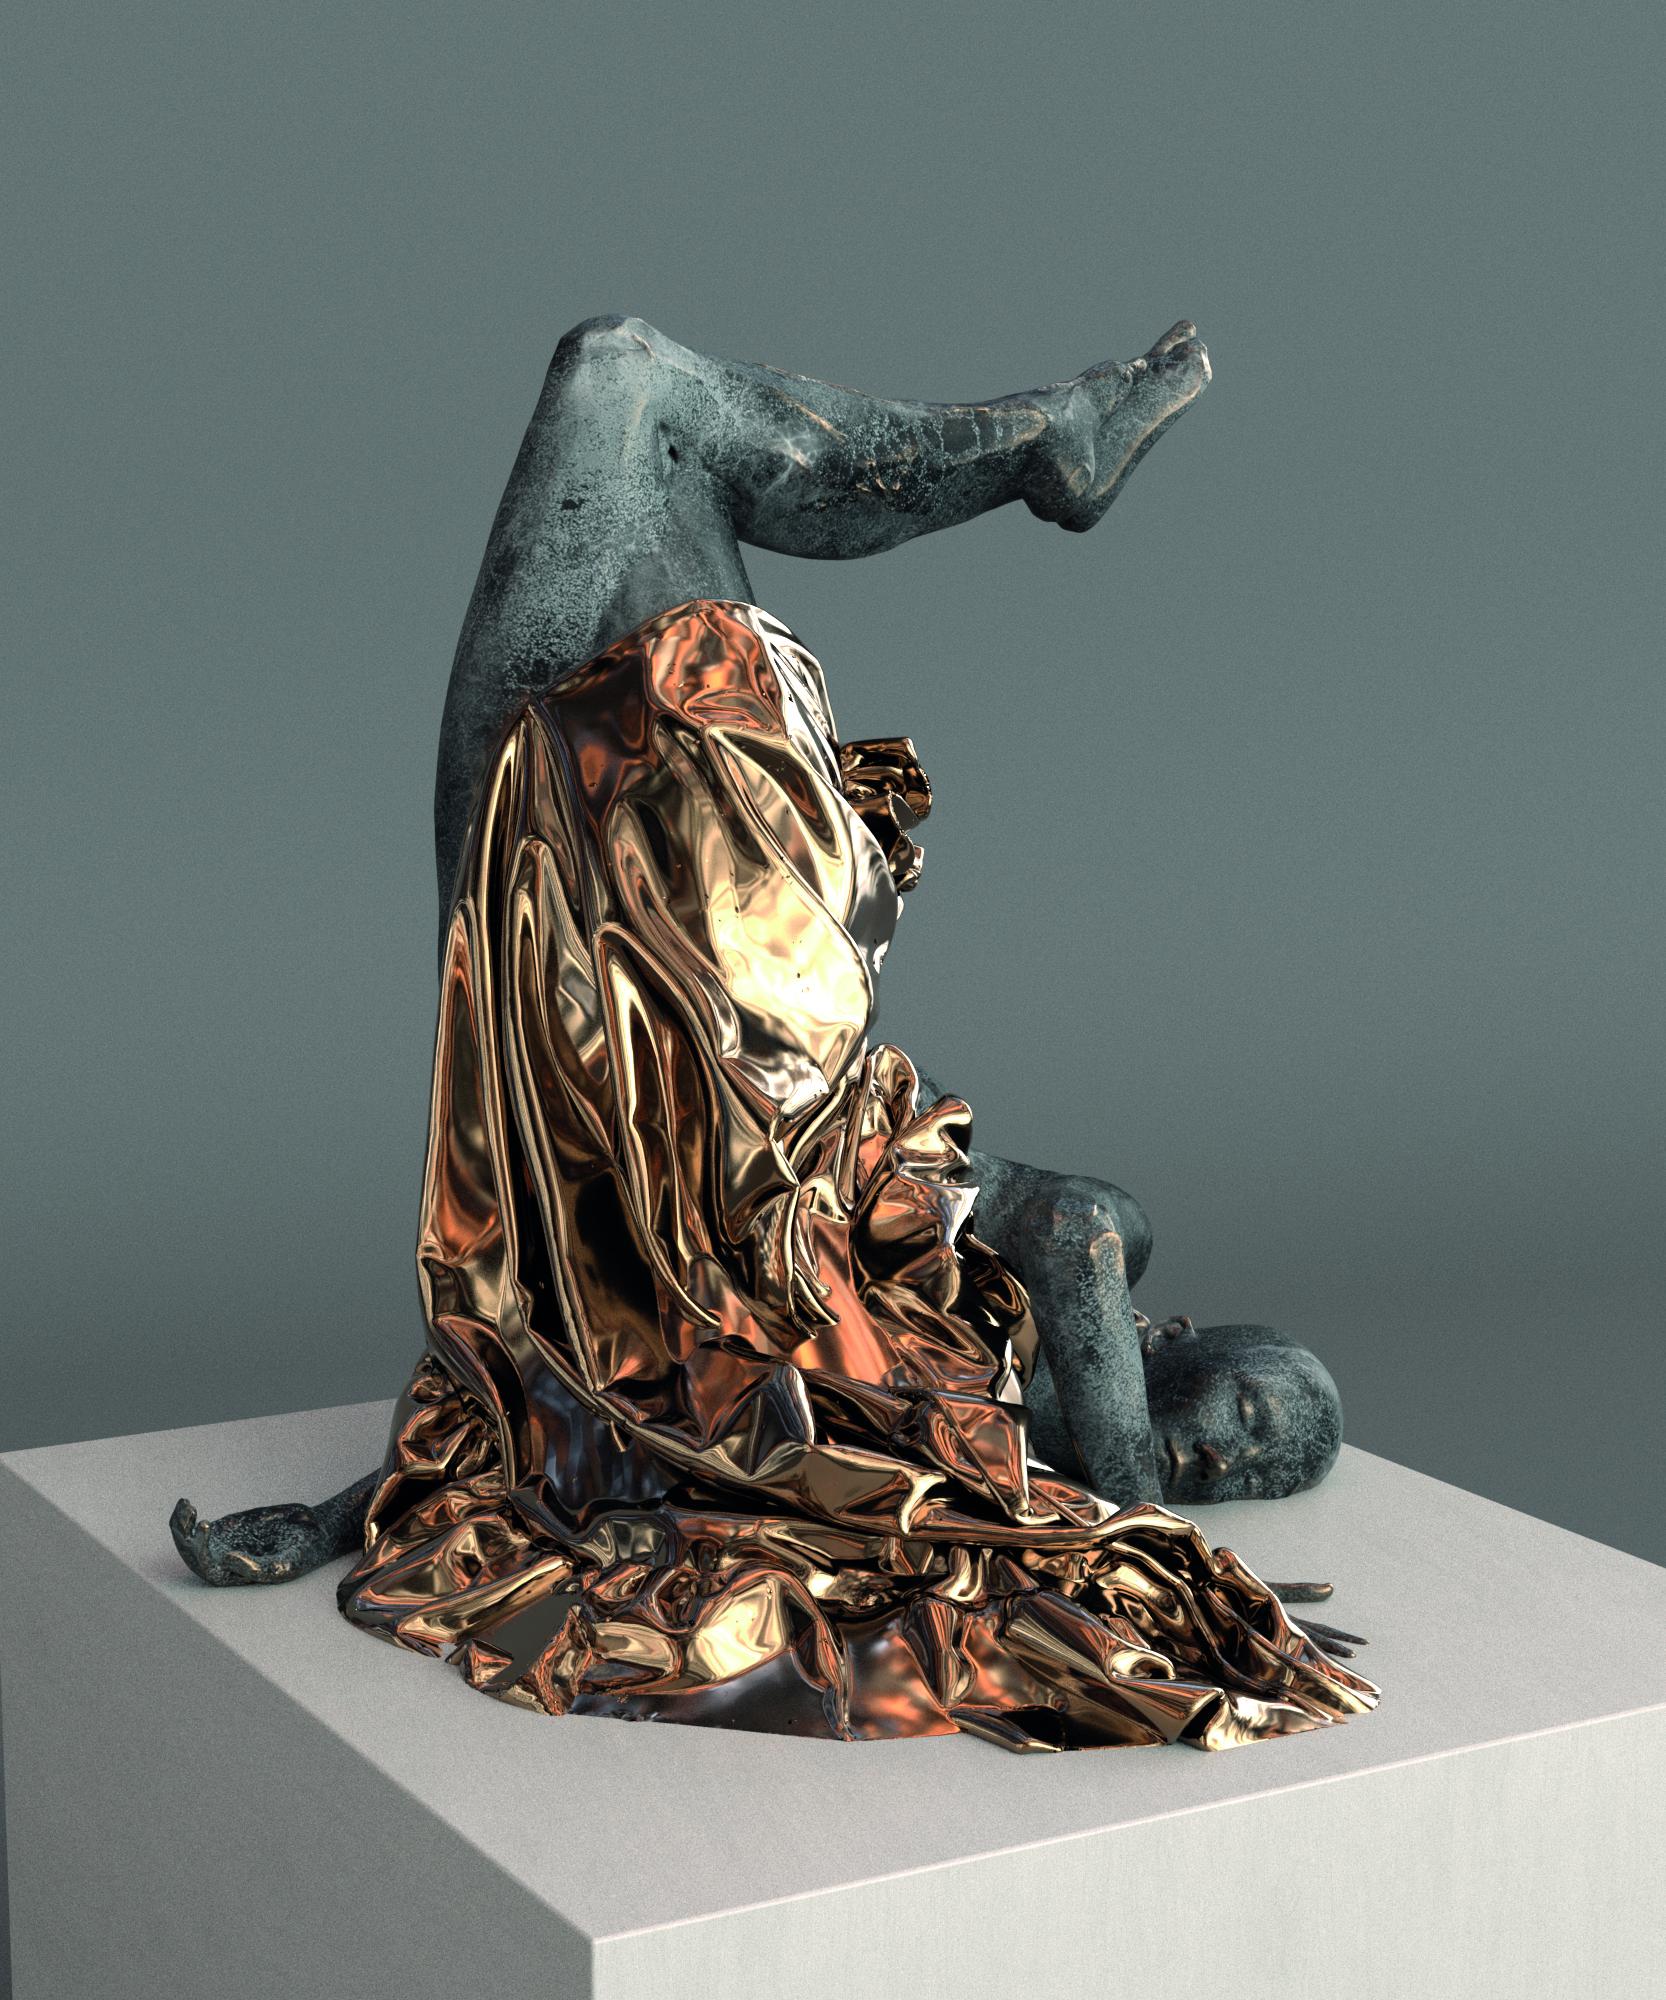 Hande Şekerciler, ecstasy self-portrait no:1, 2020, Bronze with Custom Made Chemical Patina, 92 x 112 x 101 cm.